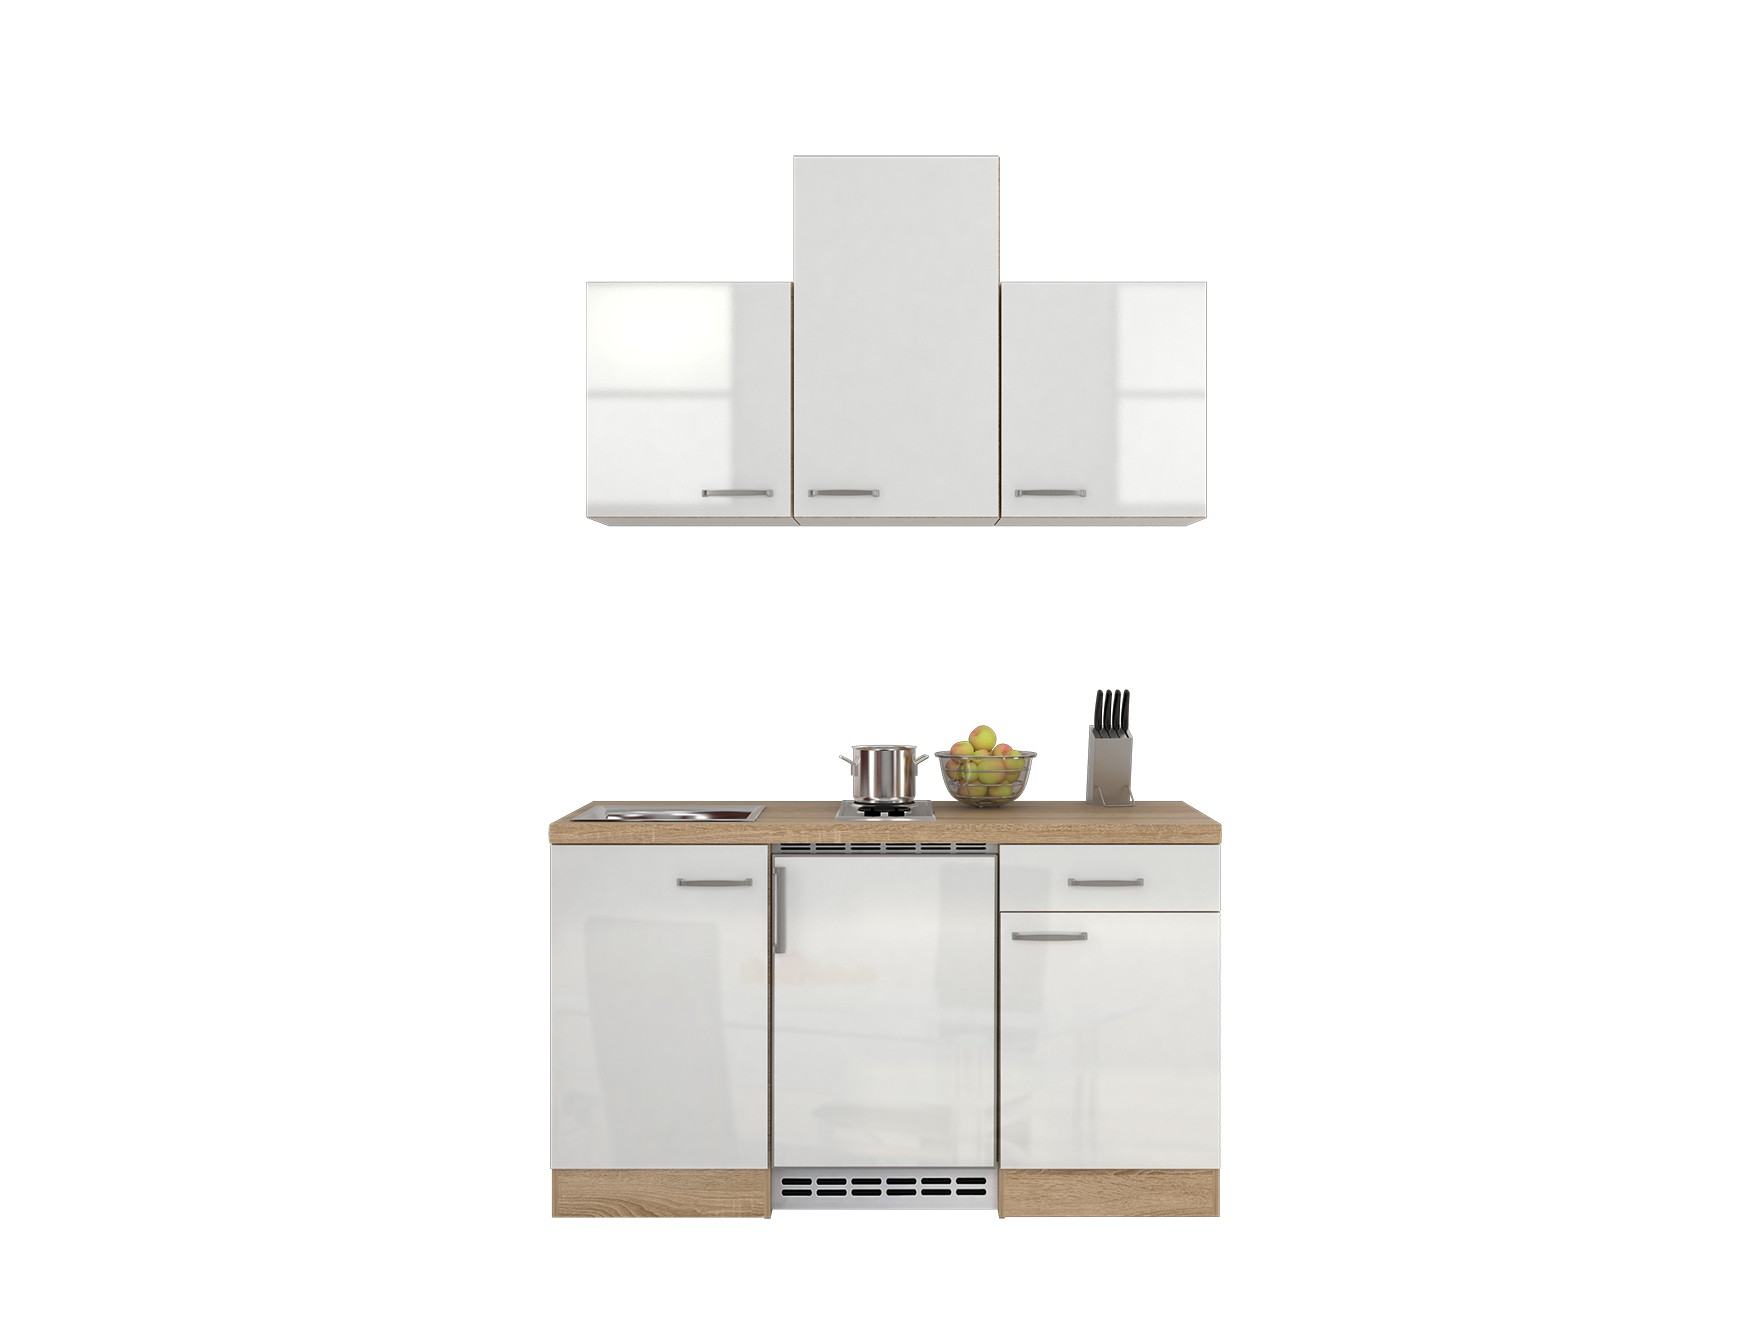 singlek che venedig 9 teilig breite 150 cm wei k che singlek chen. Black Bedroom Furniture Sets. Home Design Ideas